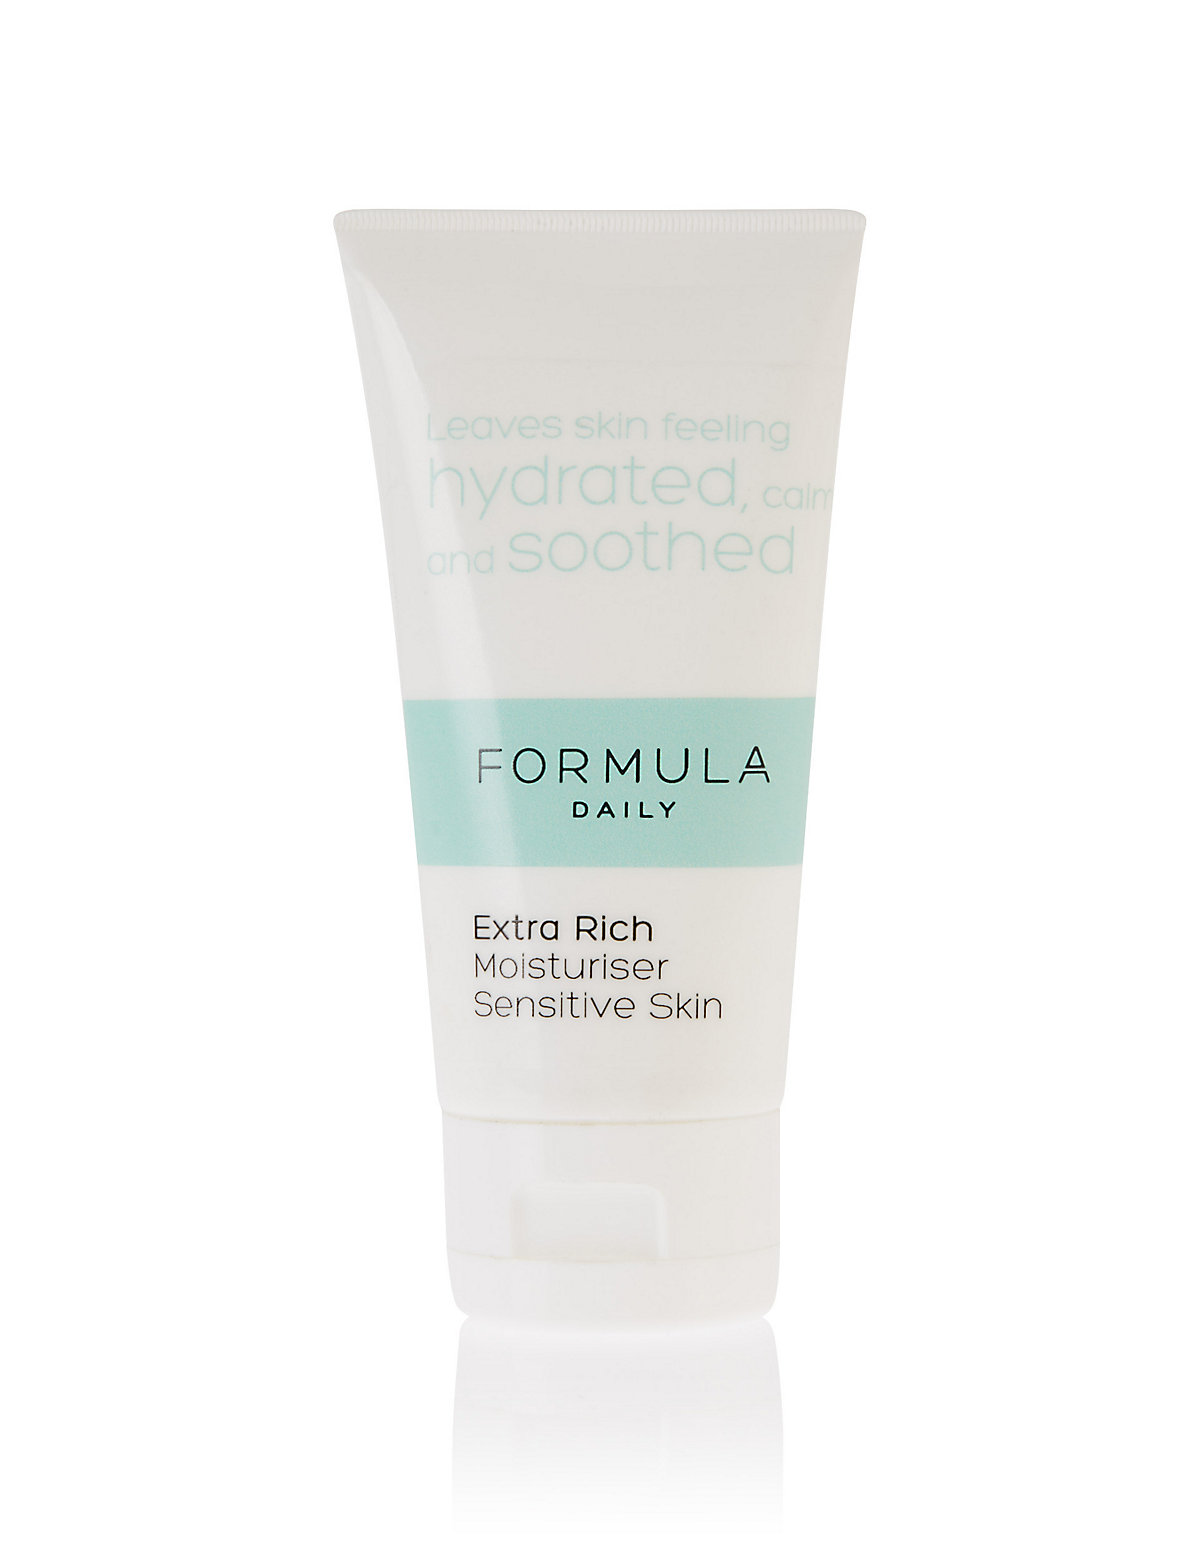 Formula Extra Rich Moisturiser Sensitive Skin 50ml